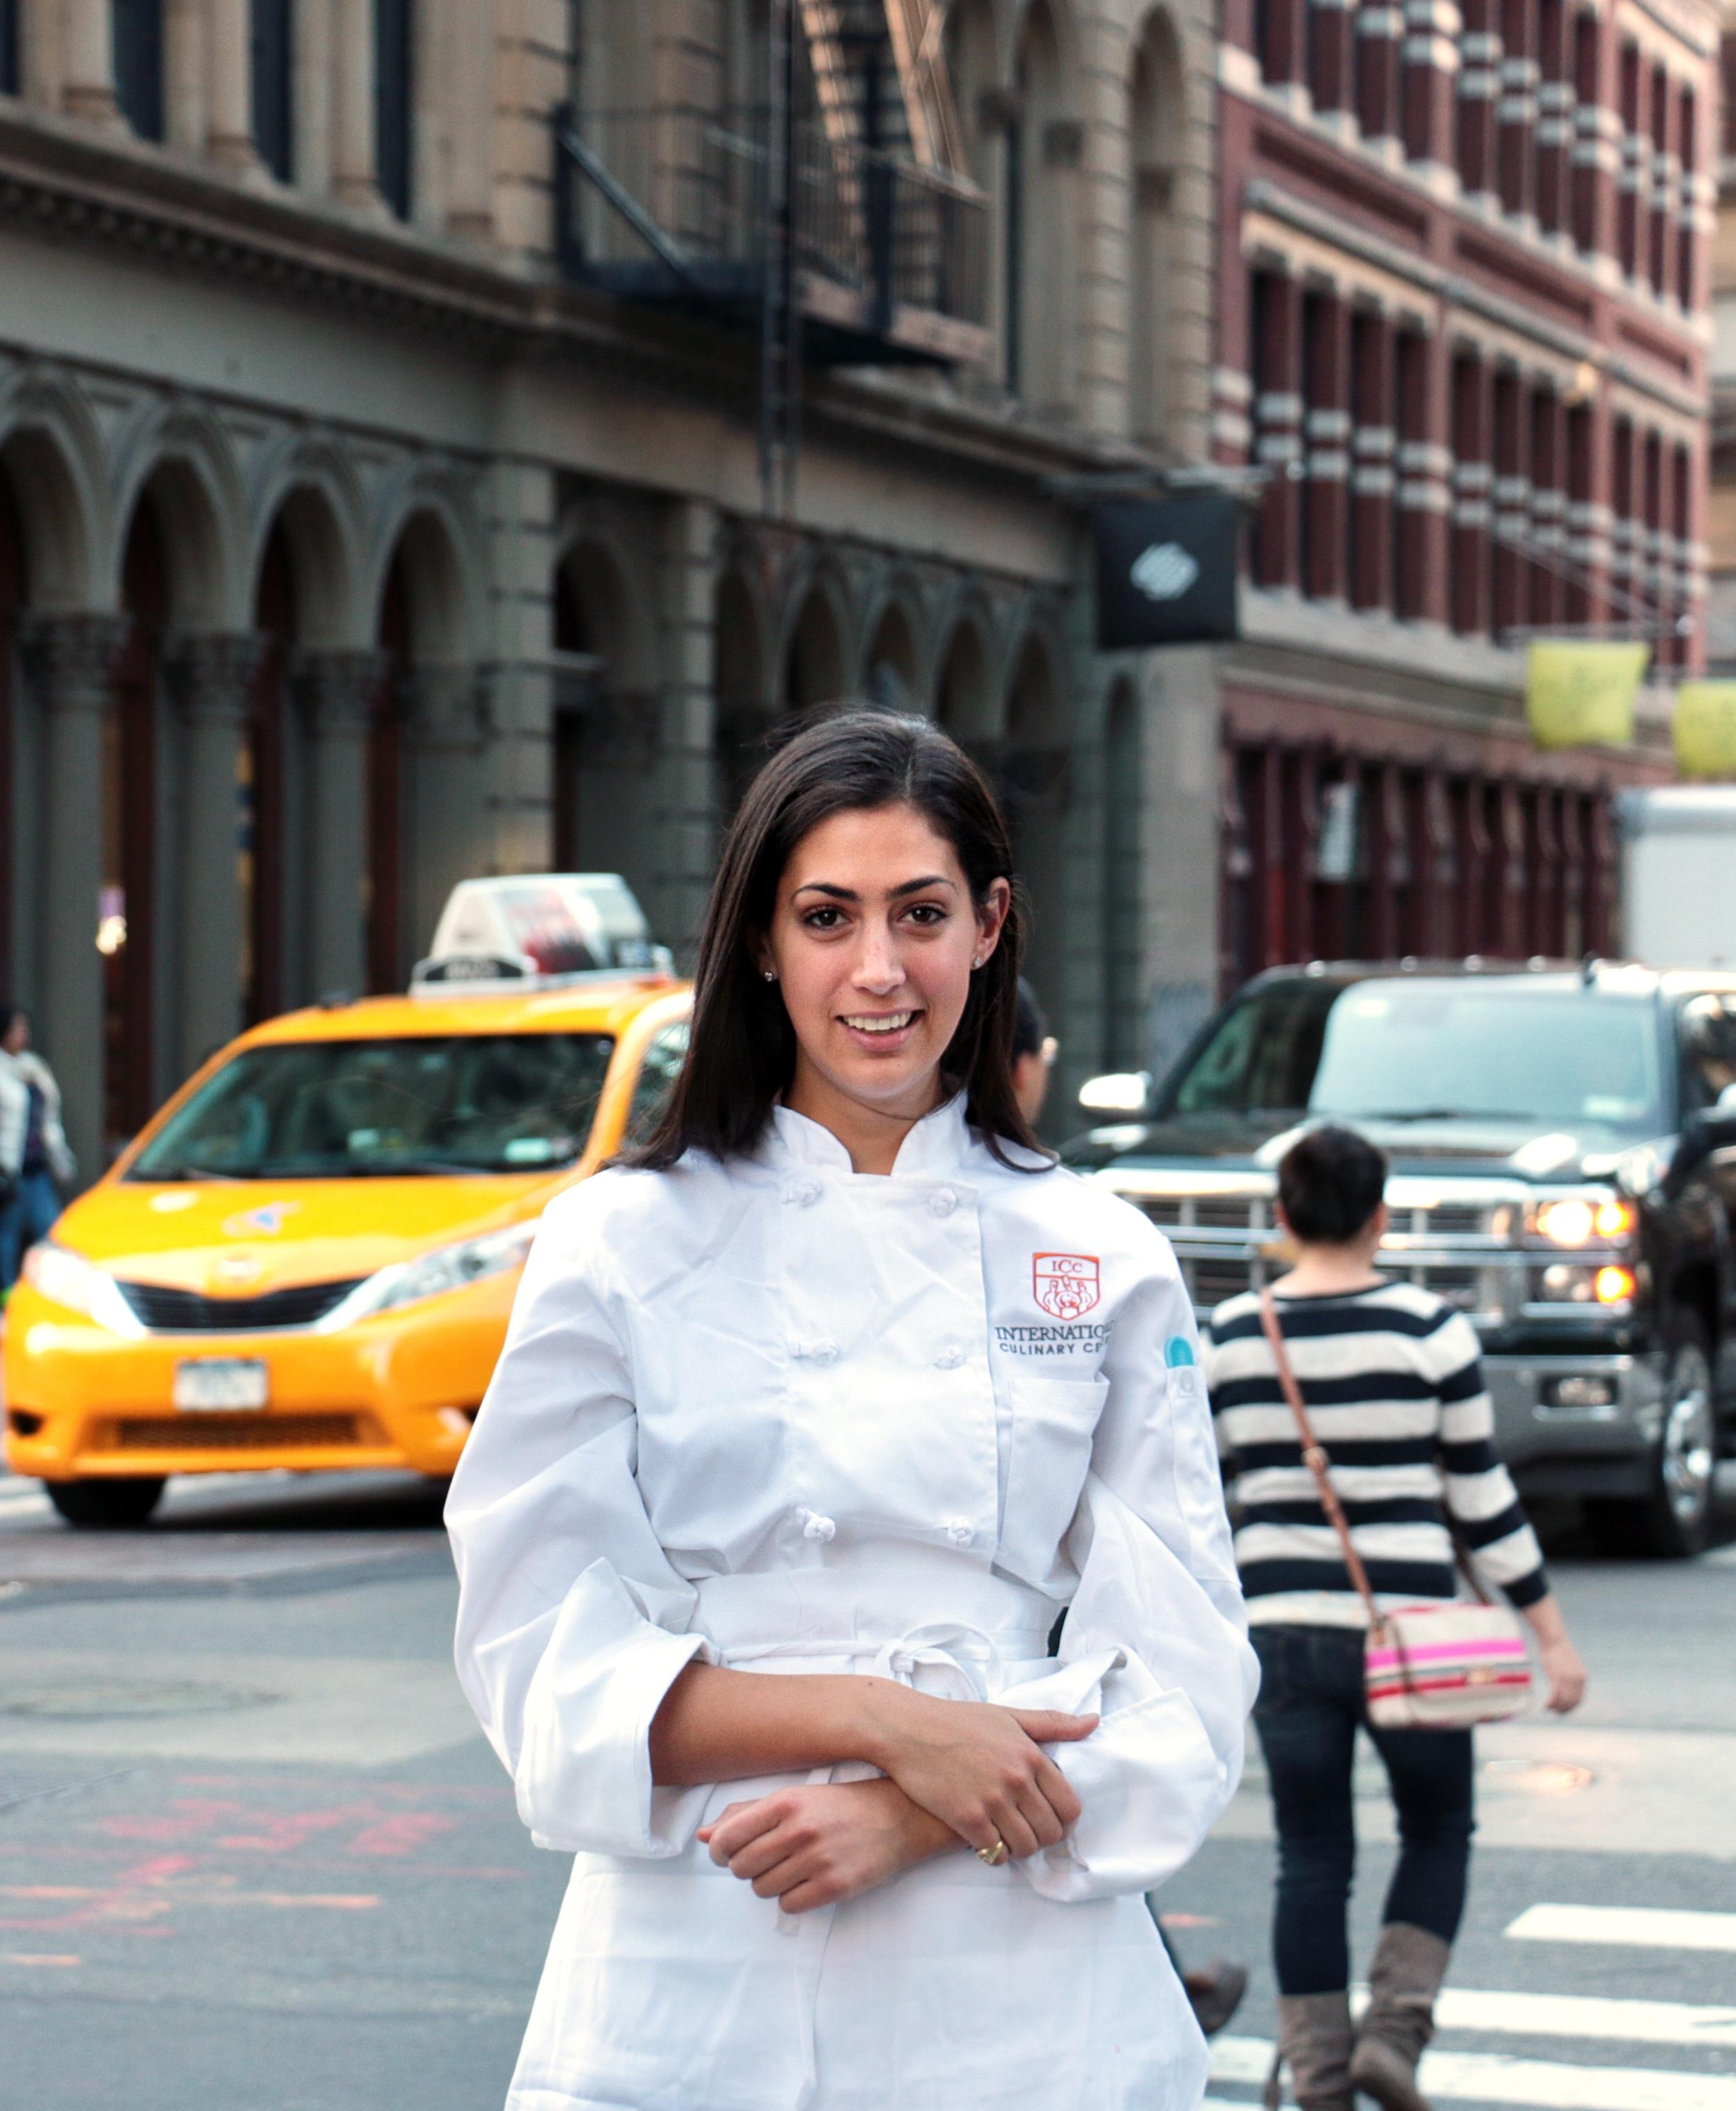 Photo courtesy of Katie Kosaya, The International Culinary Center